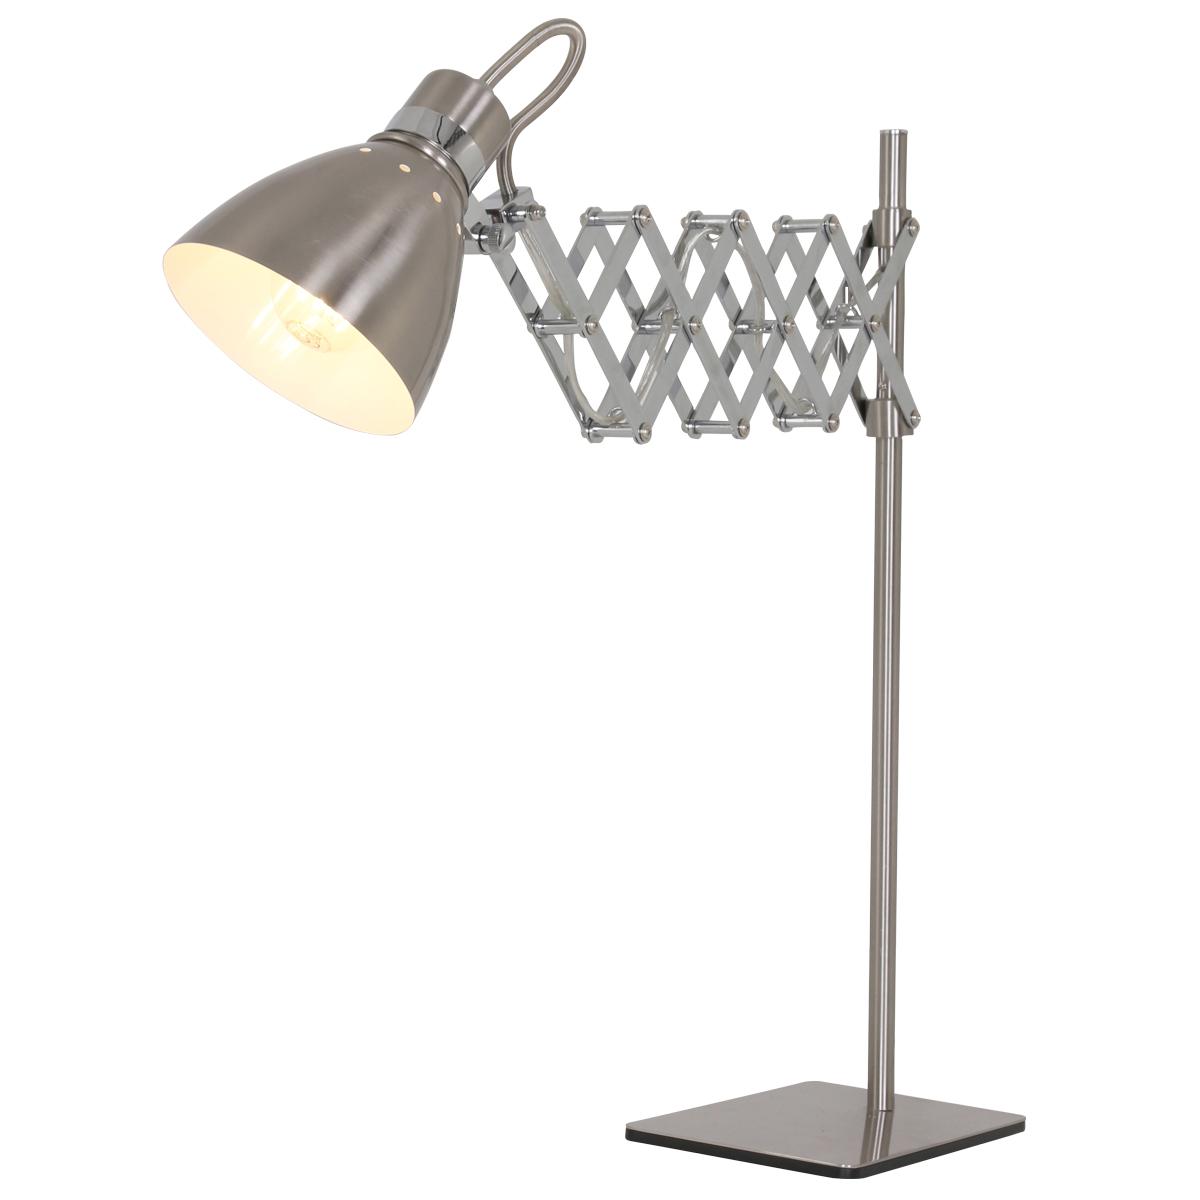 Spiksplinternieuw Praktische schaarlamp Nashville staal - Industriele lampen online EV-43